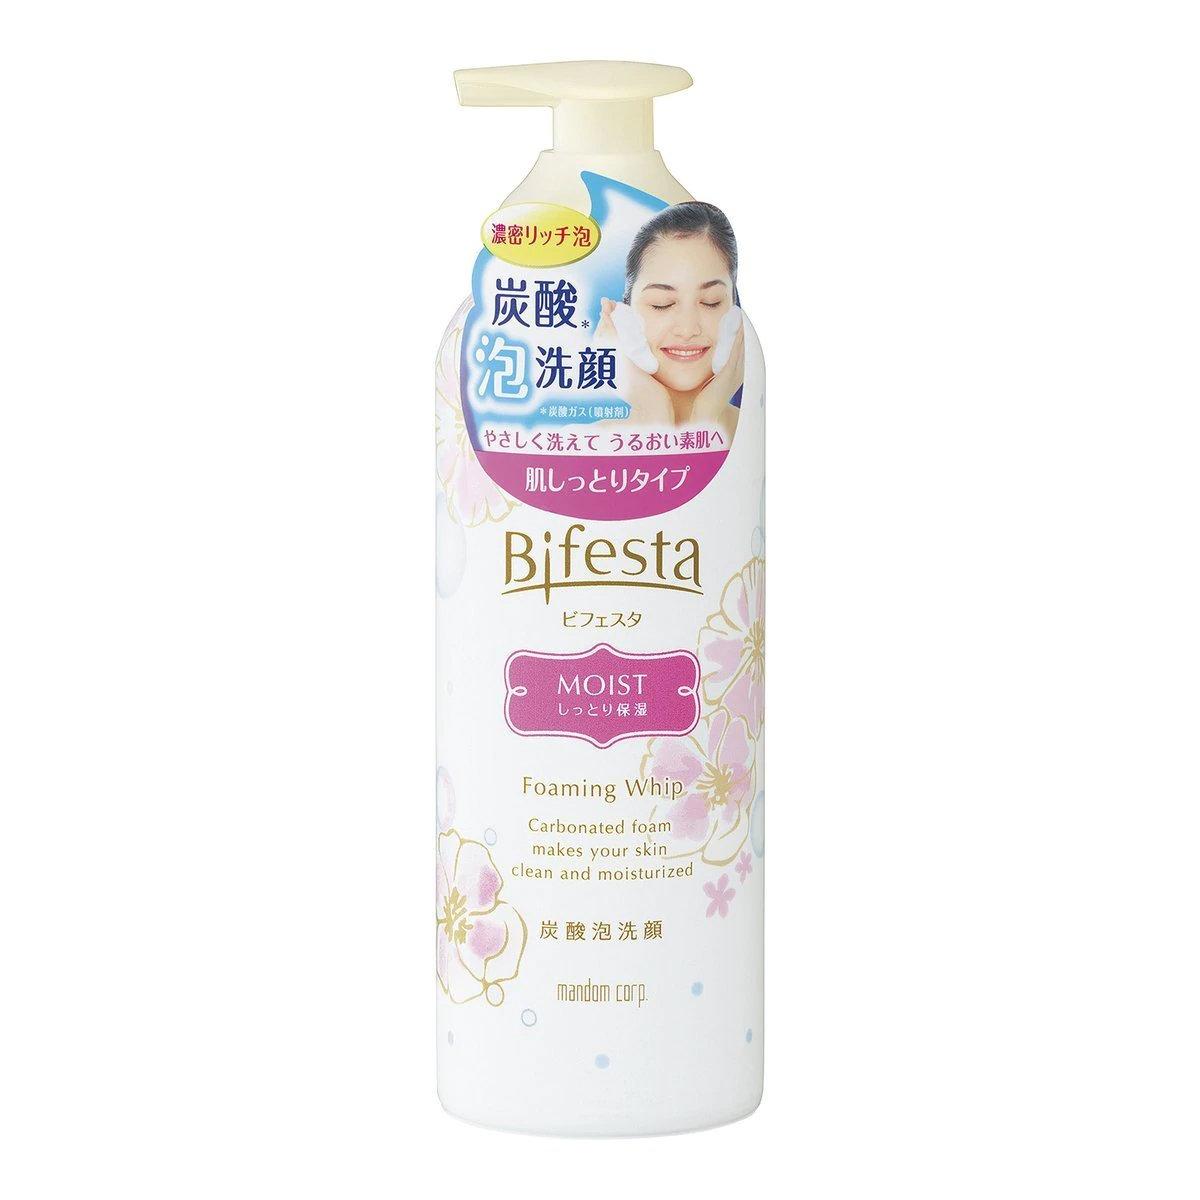 Bifesta Foaming Whip Moist Face Wash 180g (Pink)